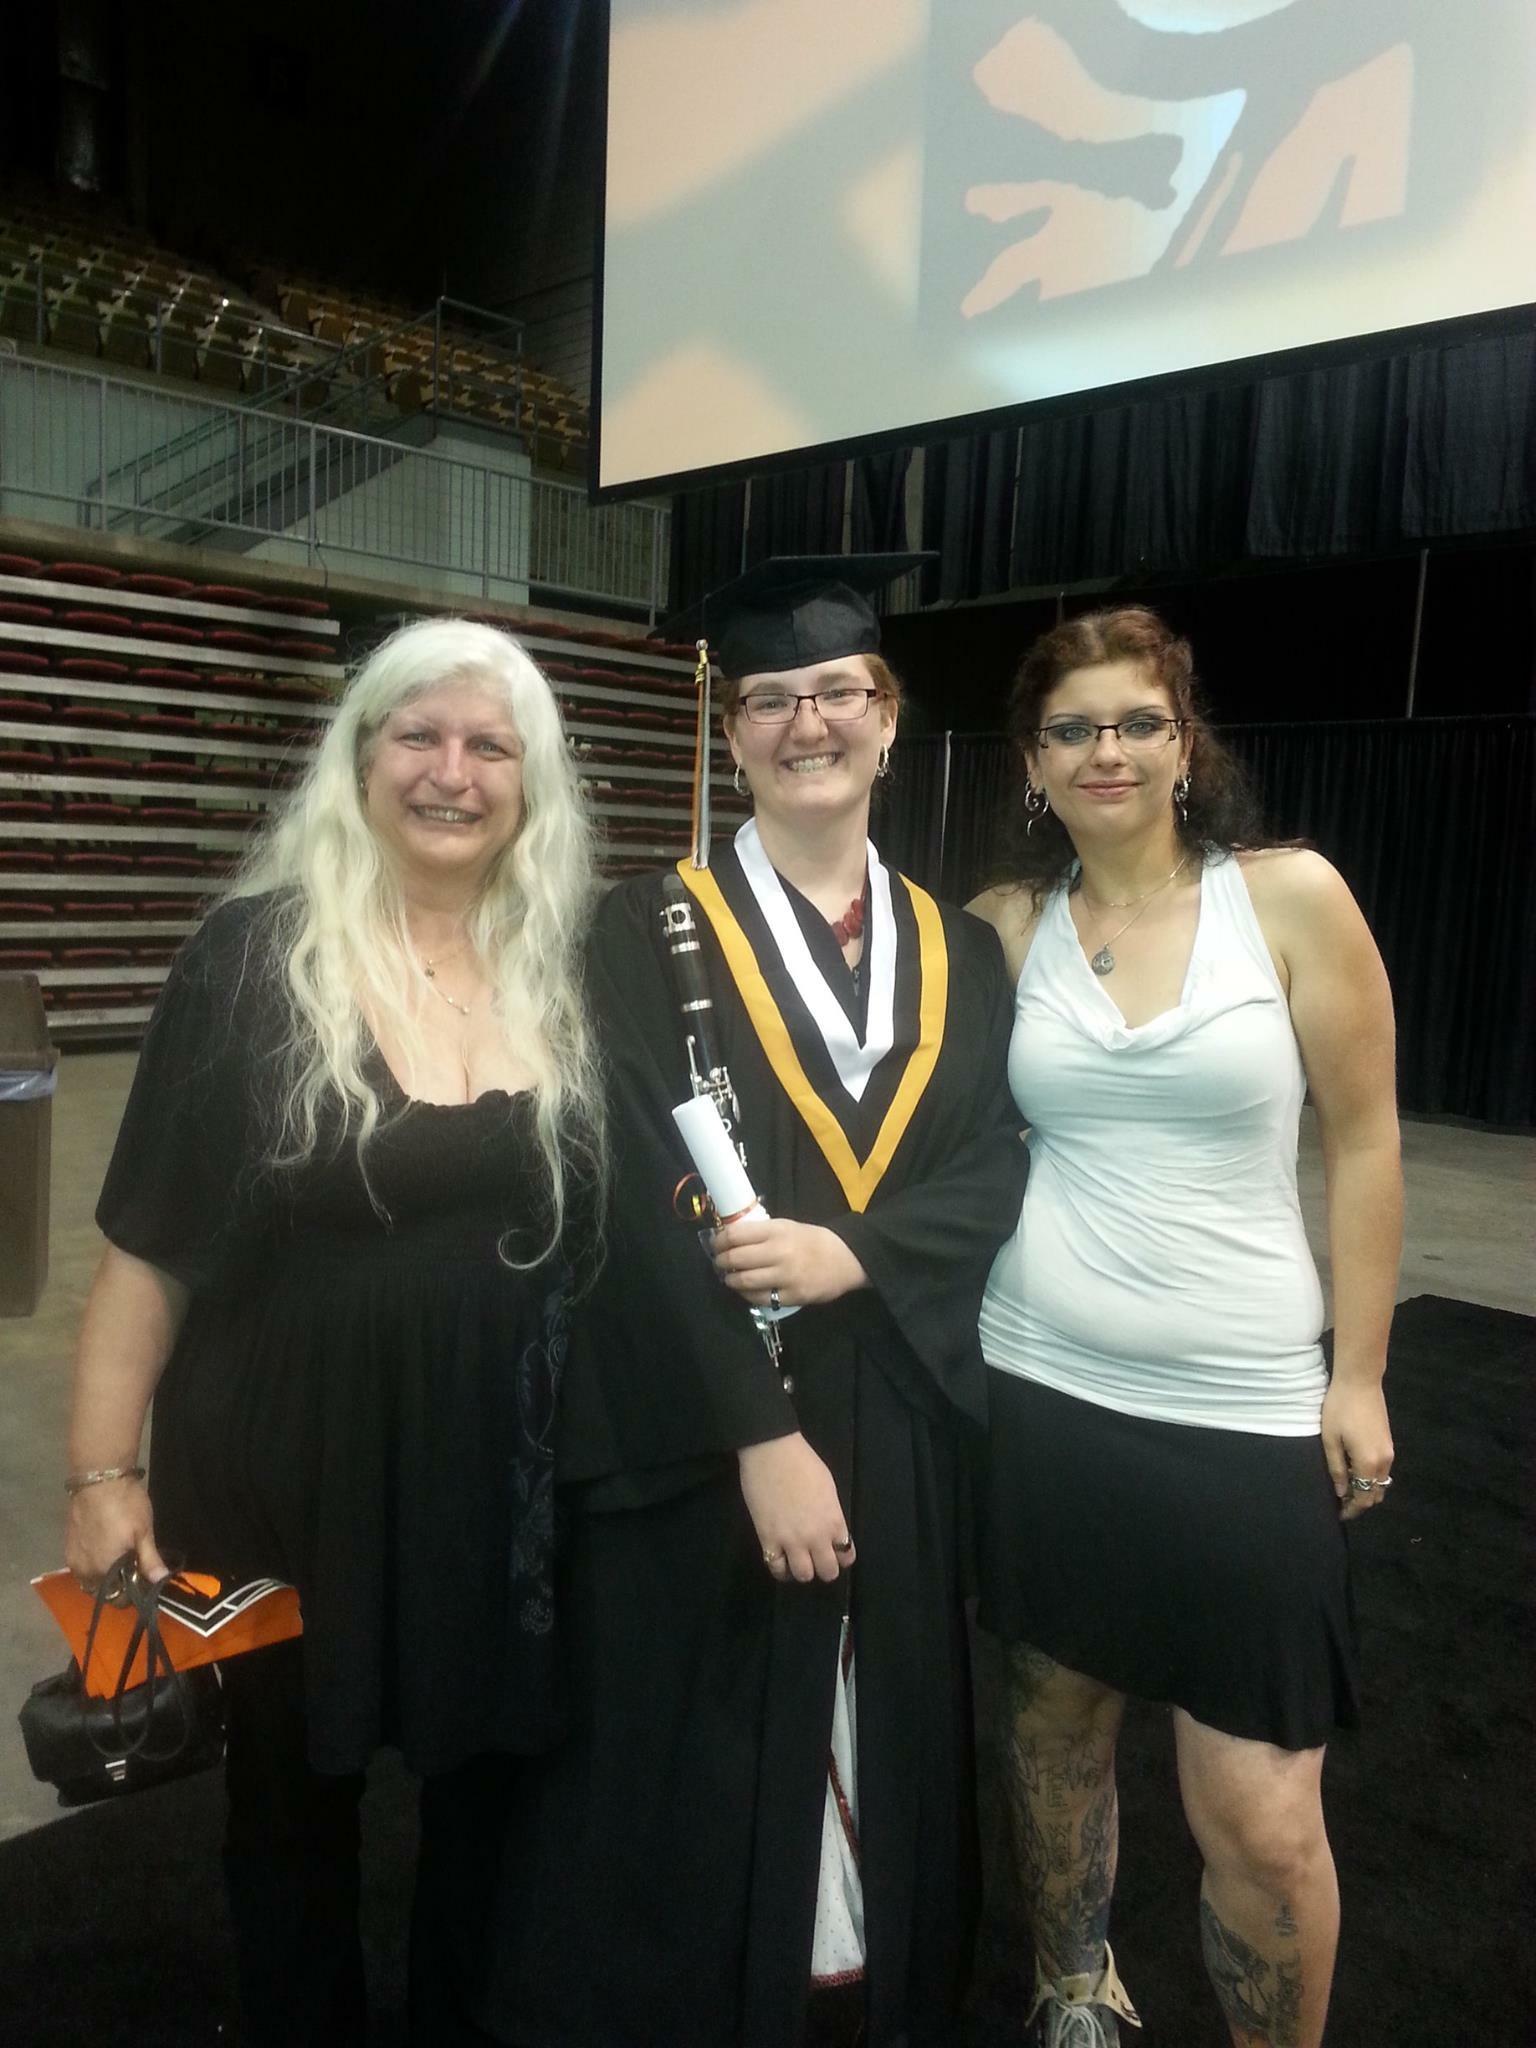 Muriel graduation.jpg